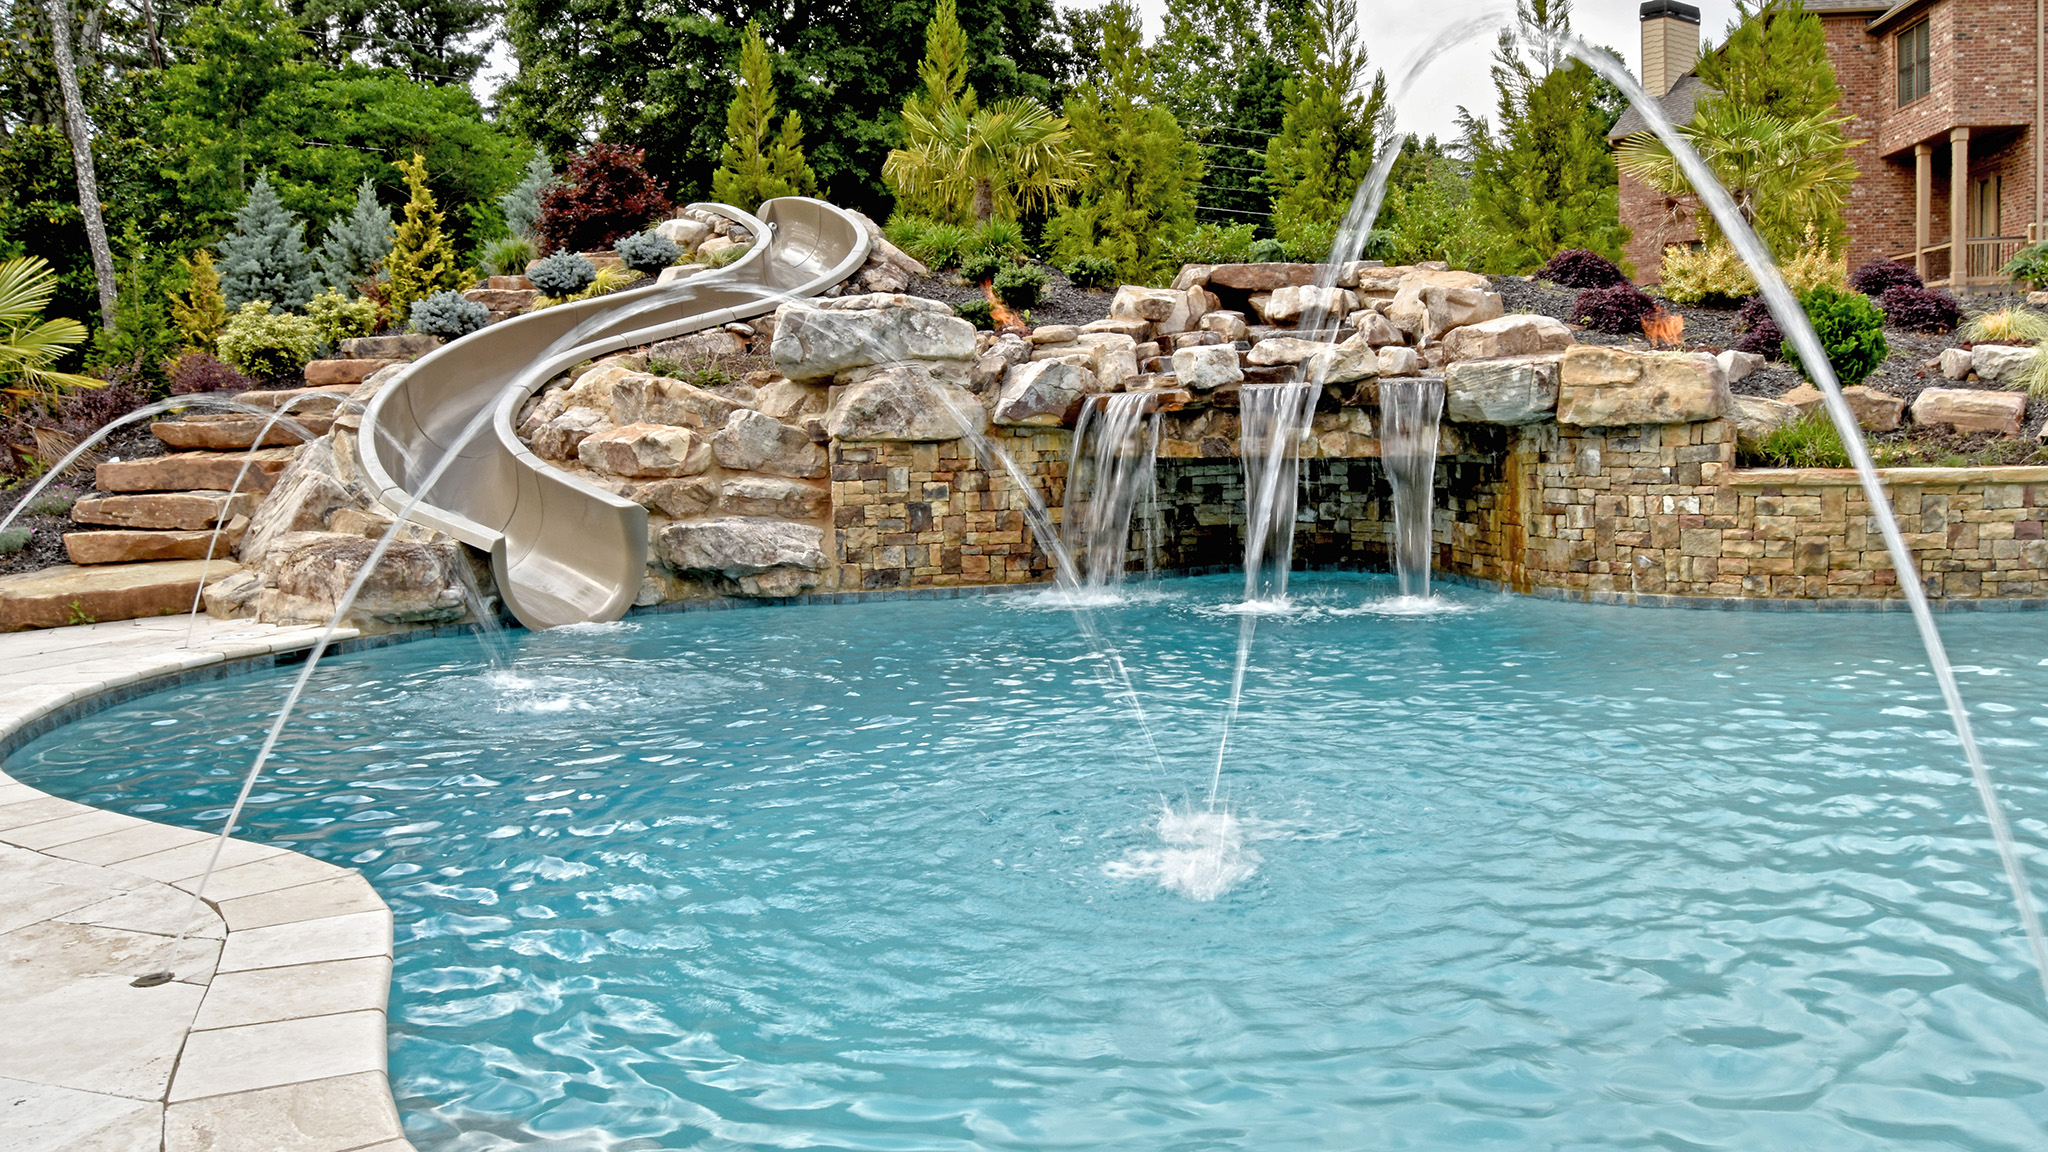 Water Features | Aqua Design Pools & Spas, LLC.